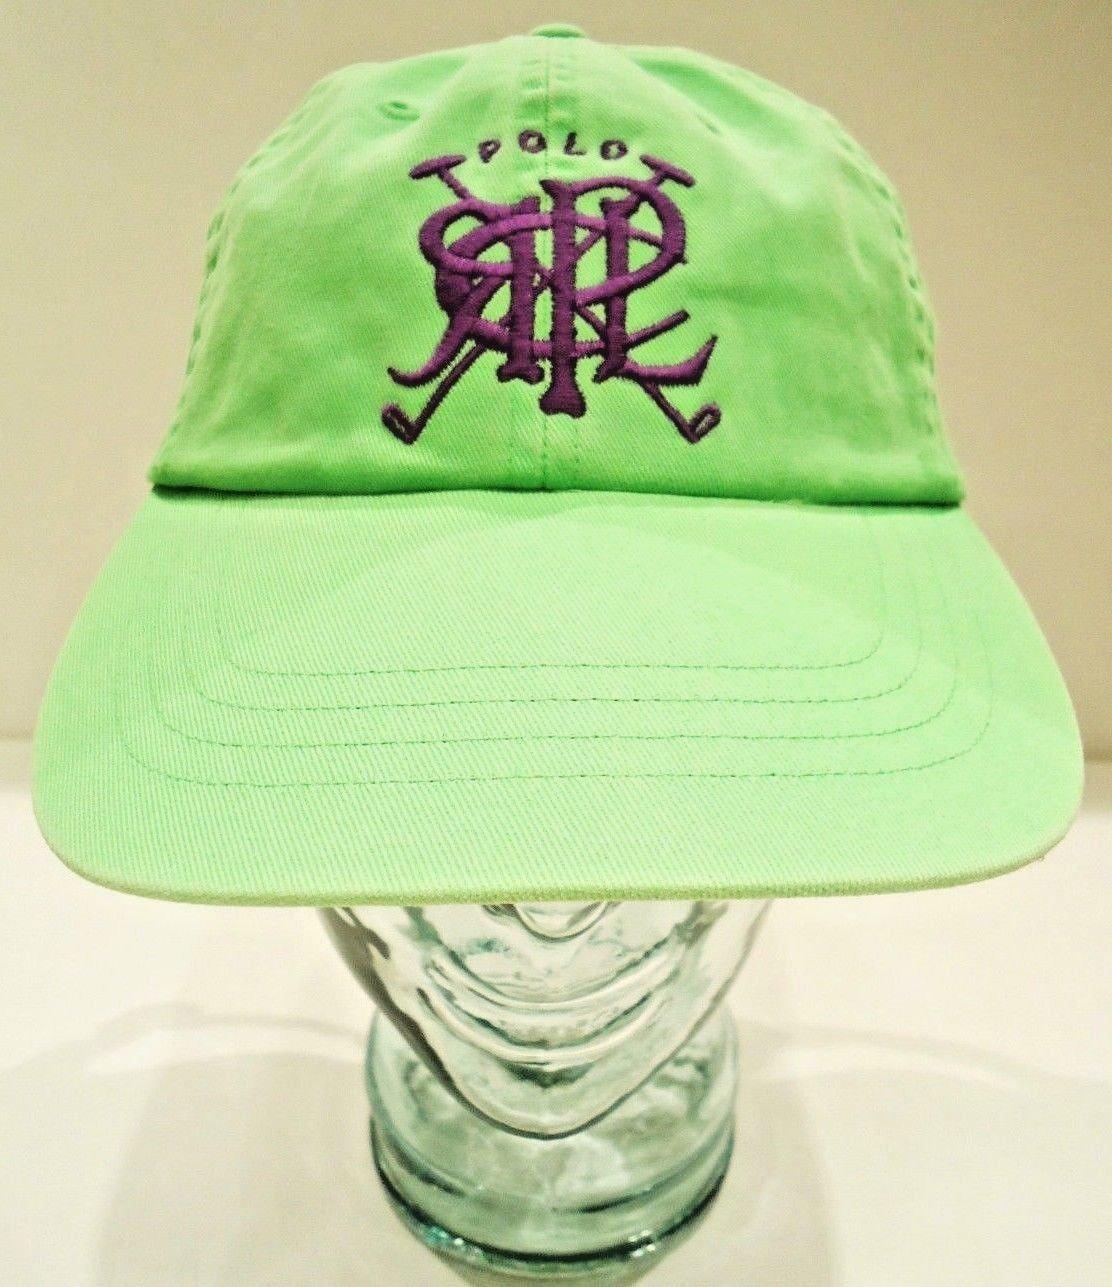 RALPH LAUREN - POLO - CROSSED - MALLETS - HAT - CAP - LIME - GREEN - RRL - NEW